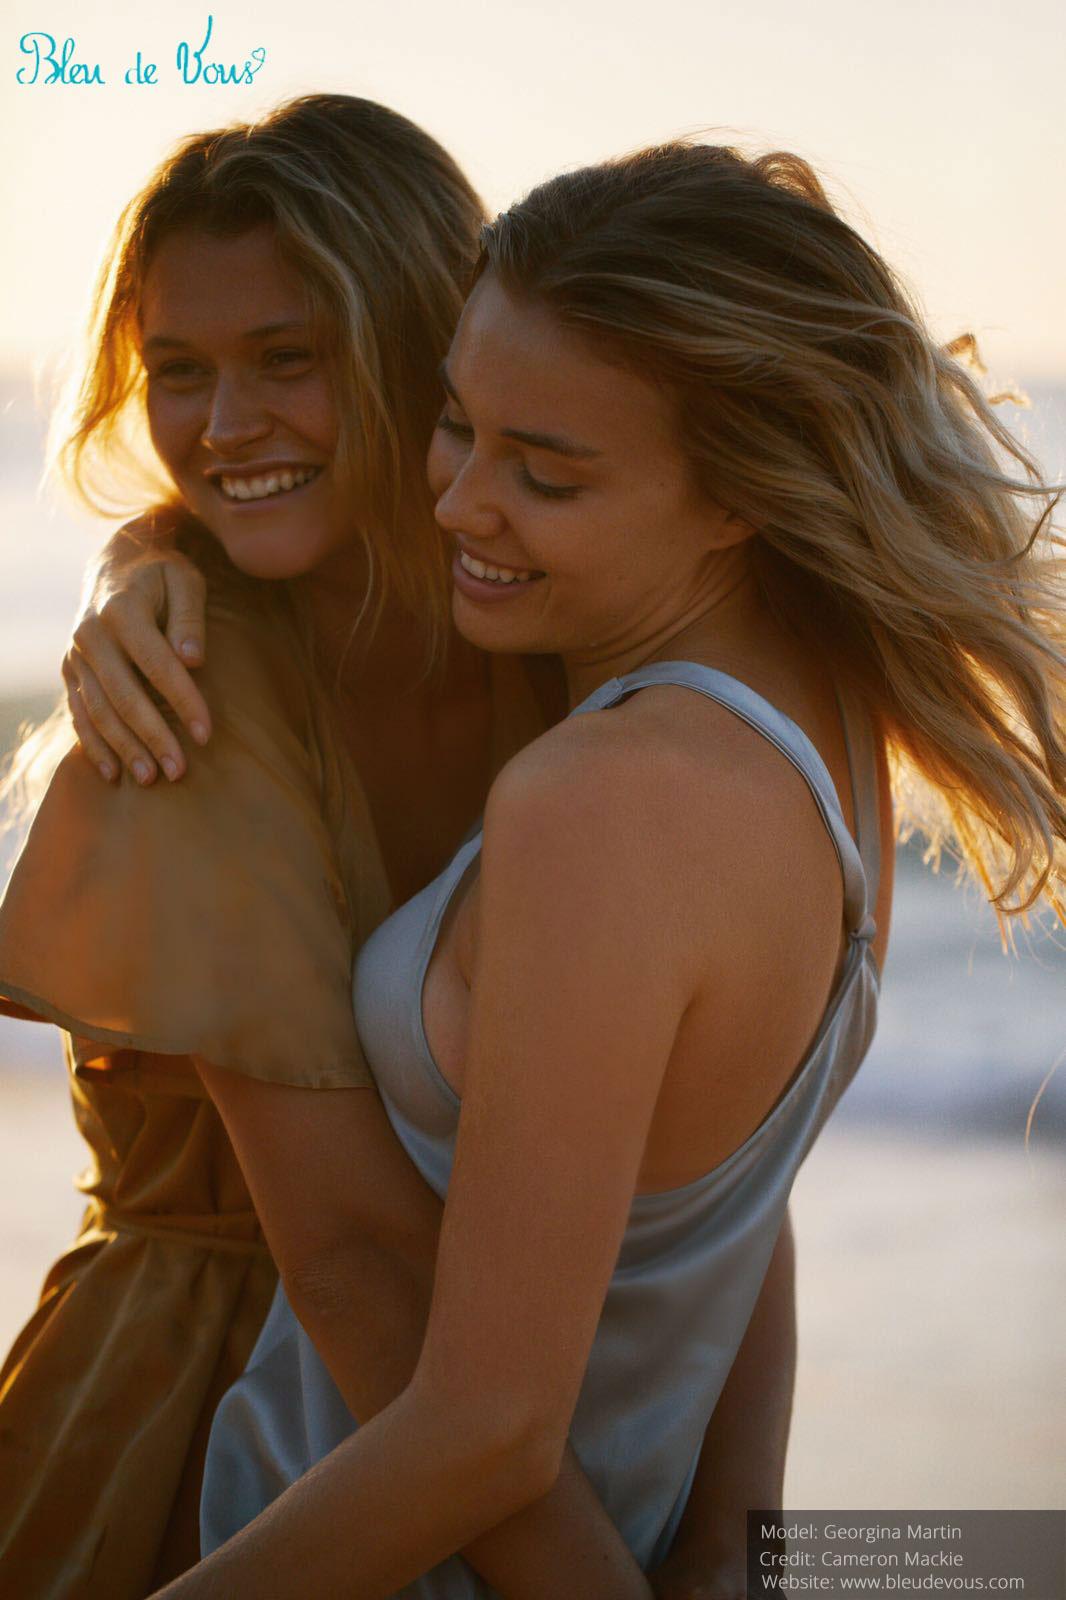 Georgina Martin and Chloe Lecareau shooting Australia